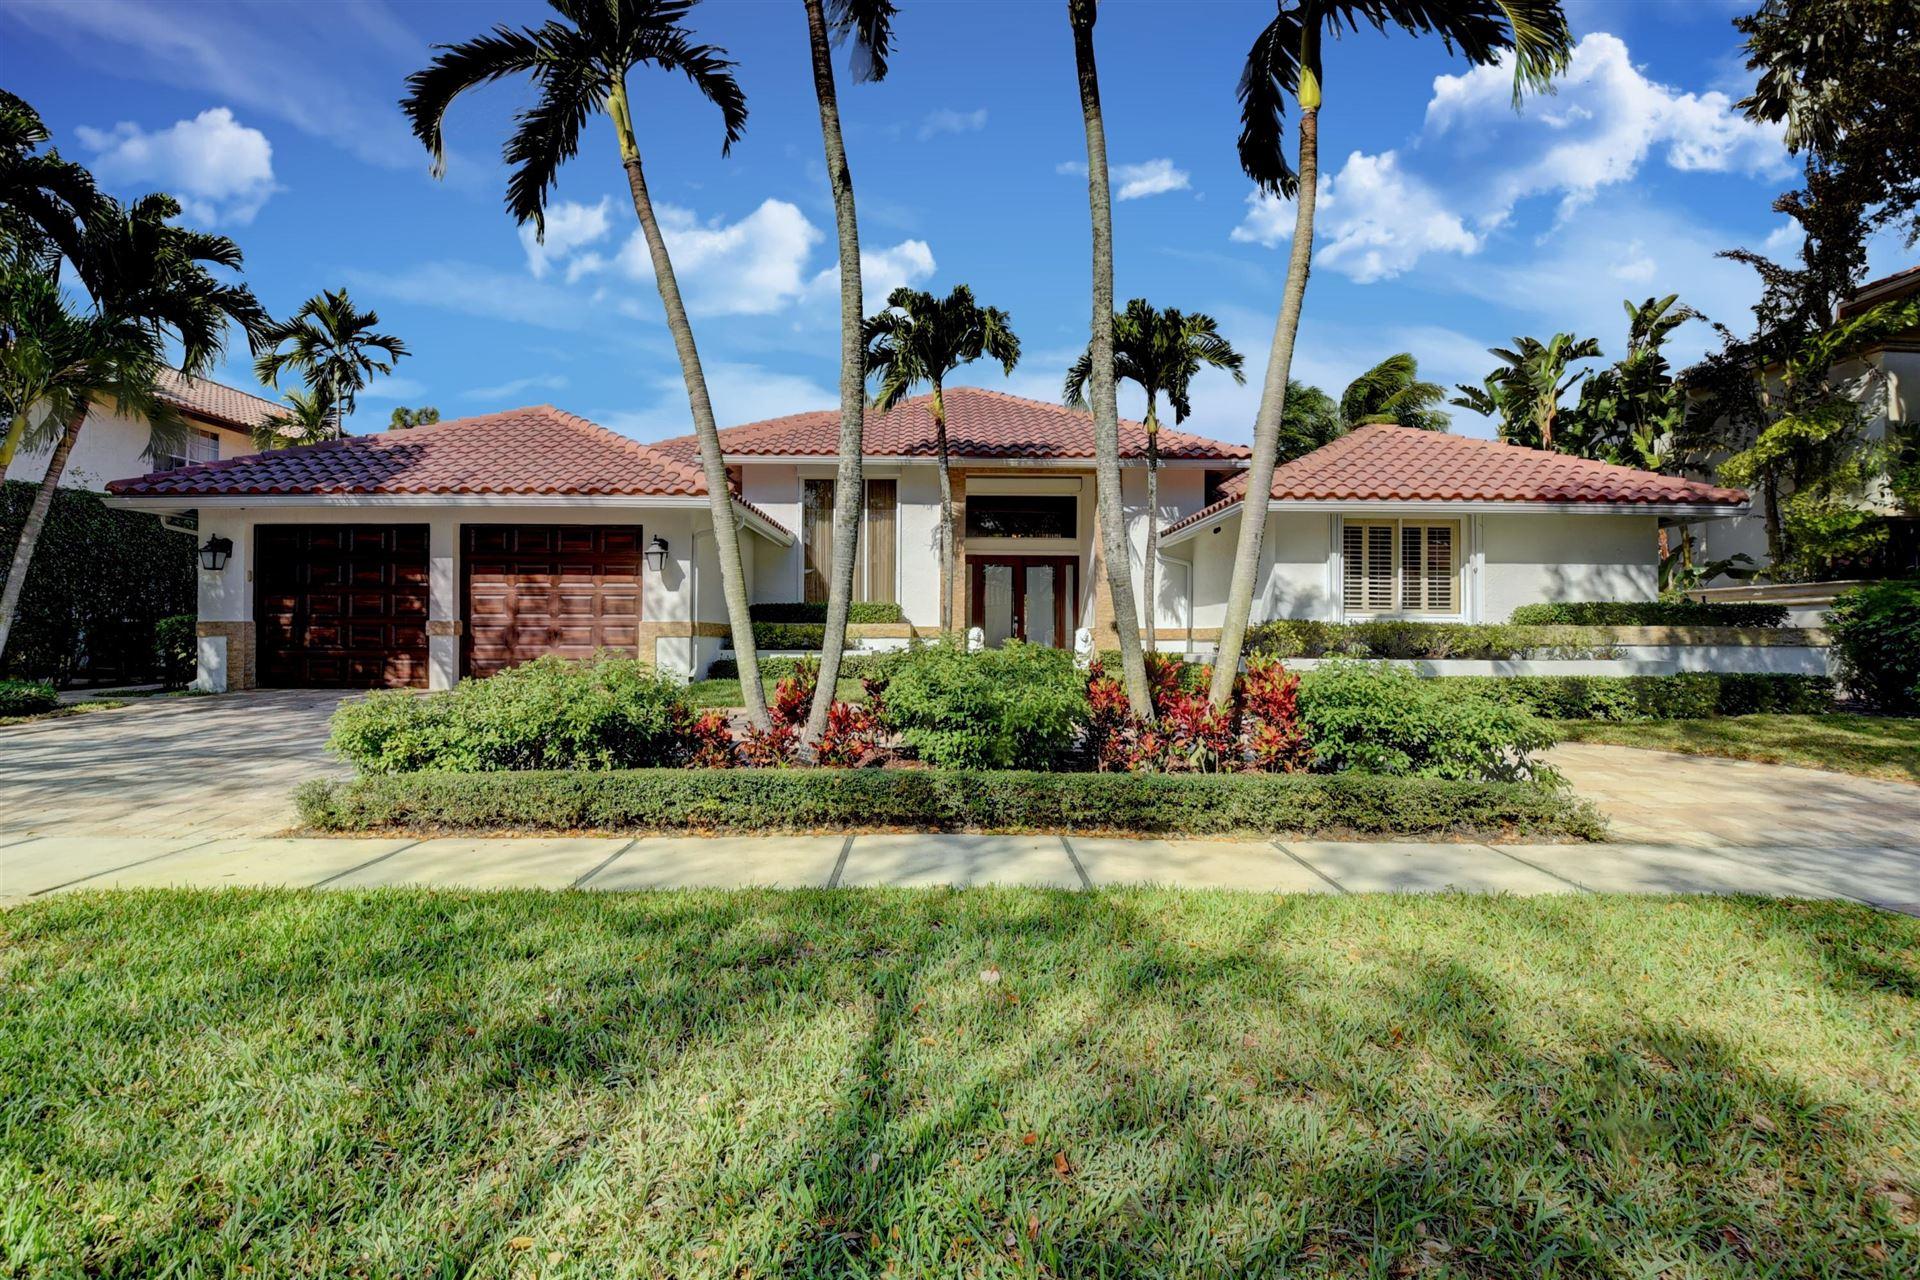 3205 Harrington Drive, Boca Raton, FL 33496 - #: RX-10593902